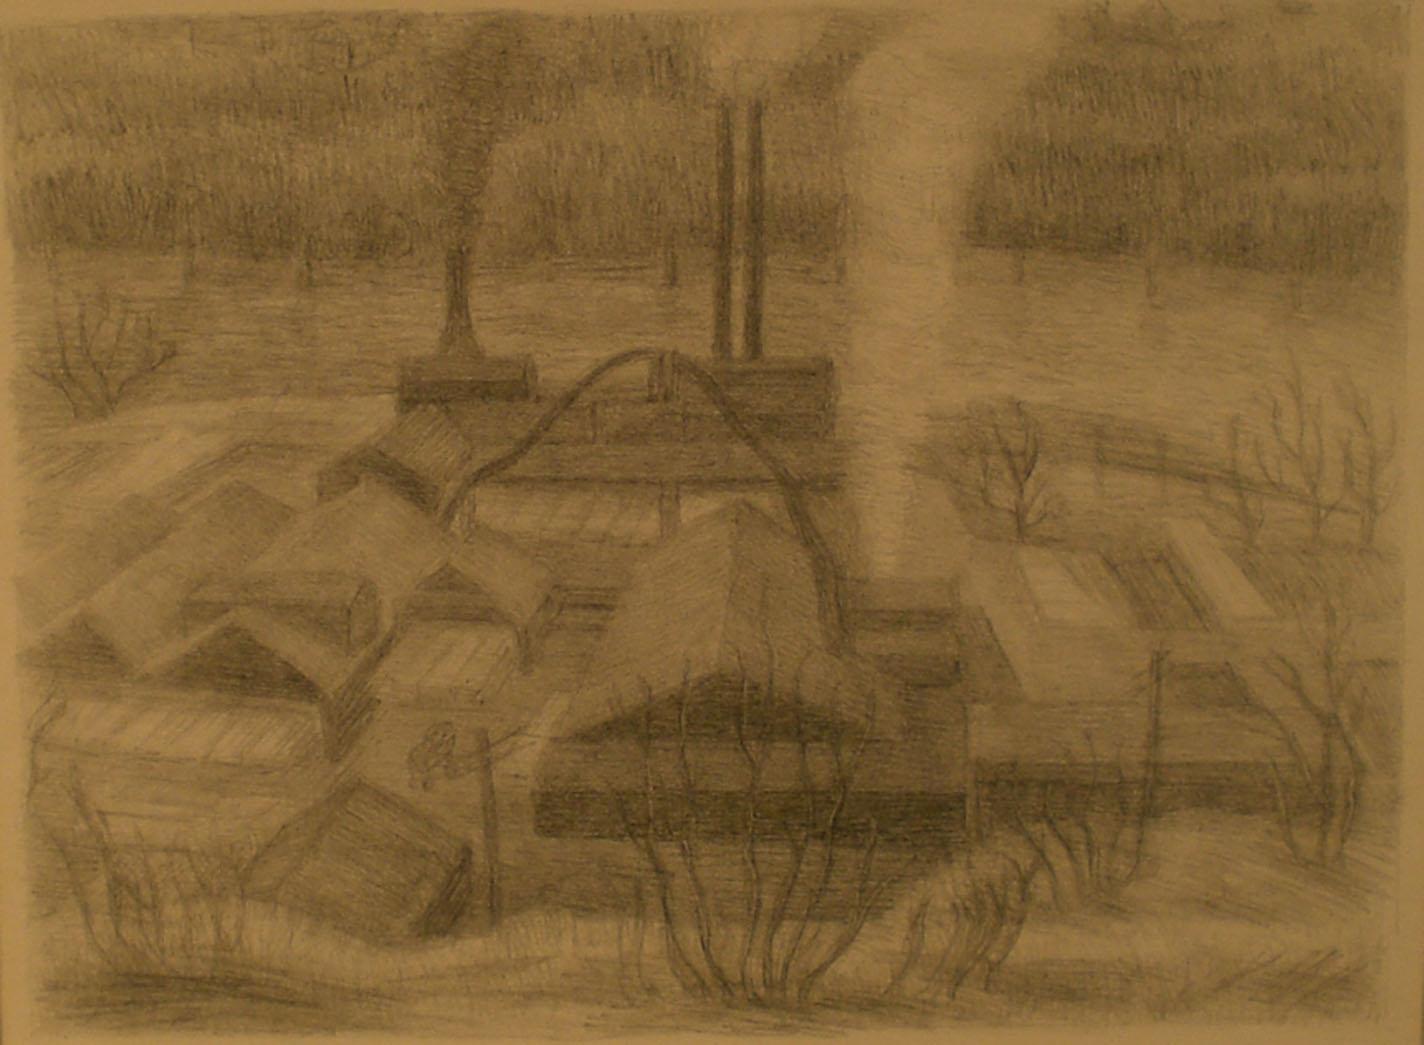 Saw Mill , 18 ¼ x 15 ¾  Charles Haney